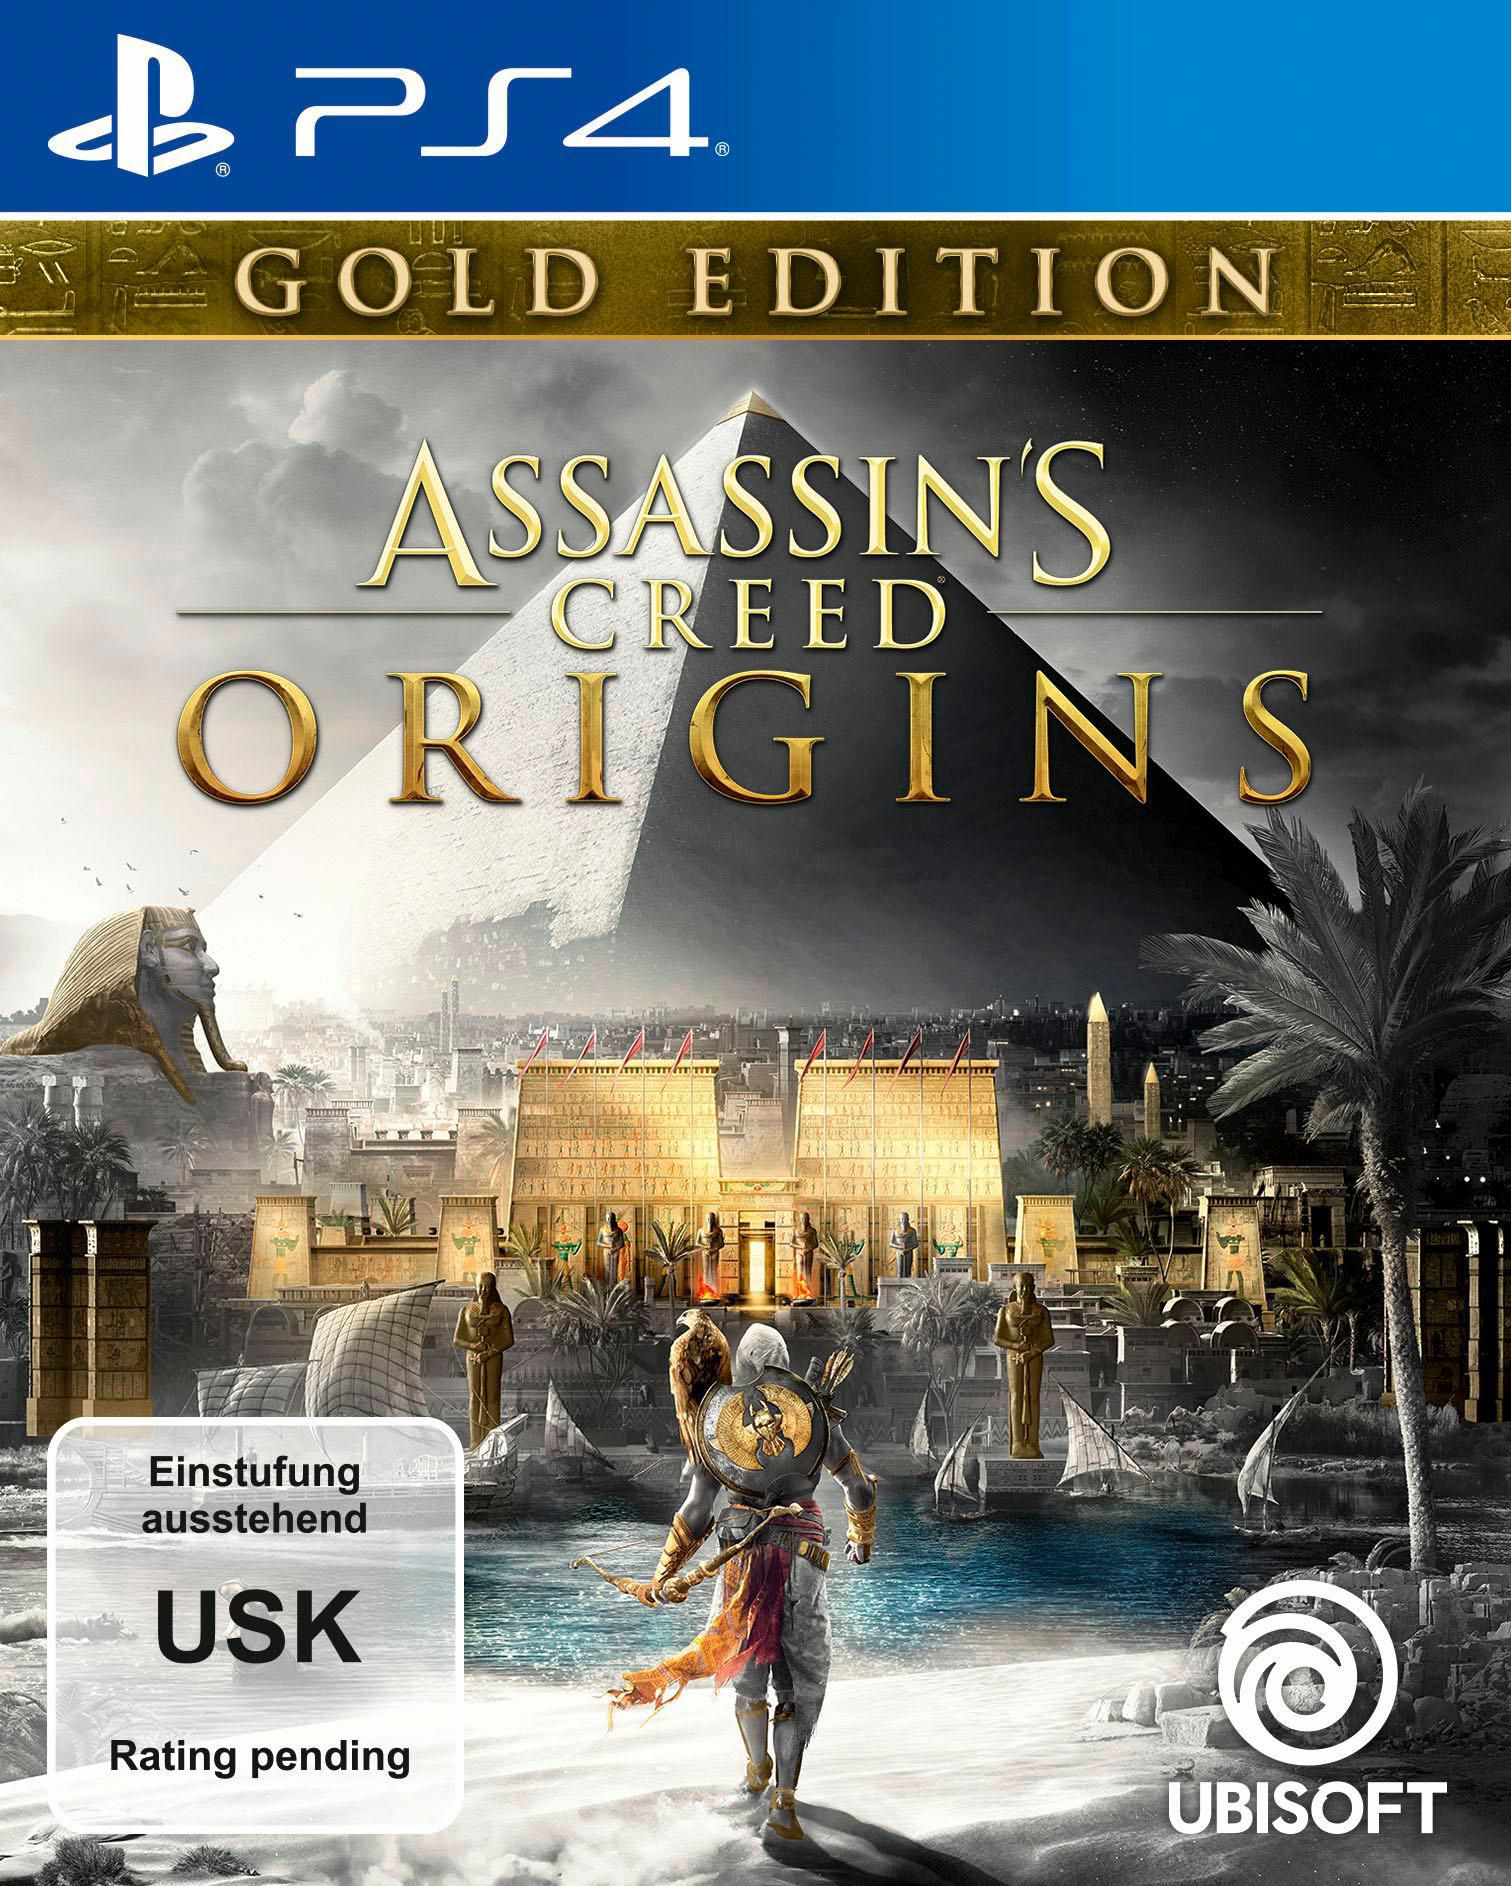 UBISOFT Assassin's Creed Origins Gold Edition (PS4)